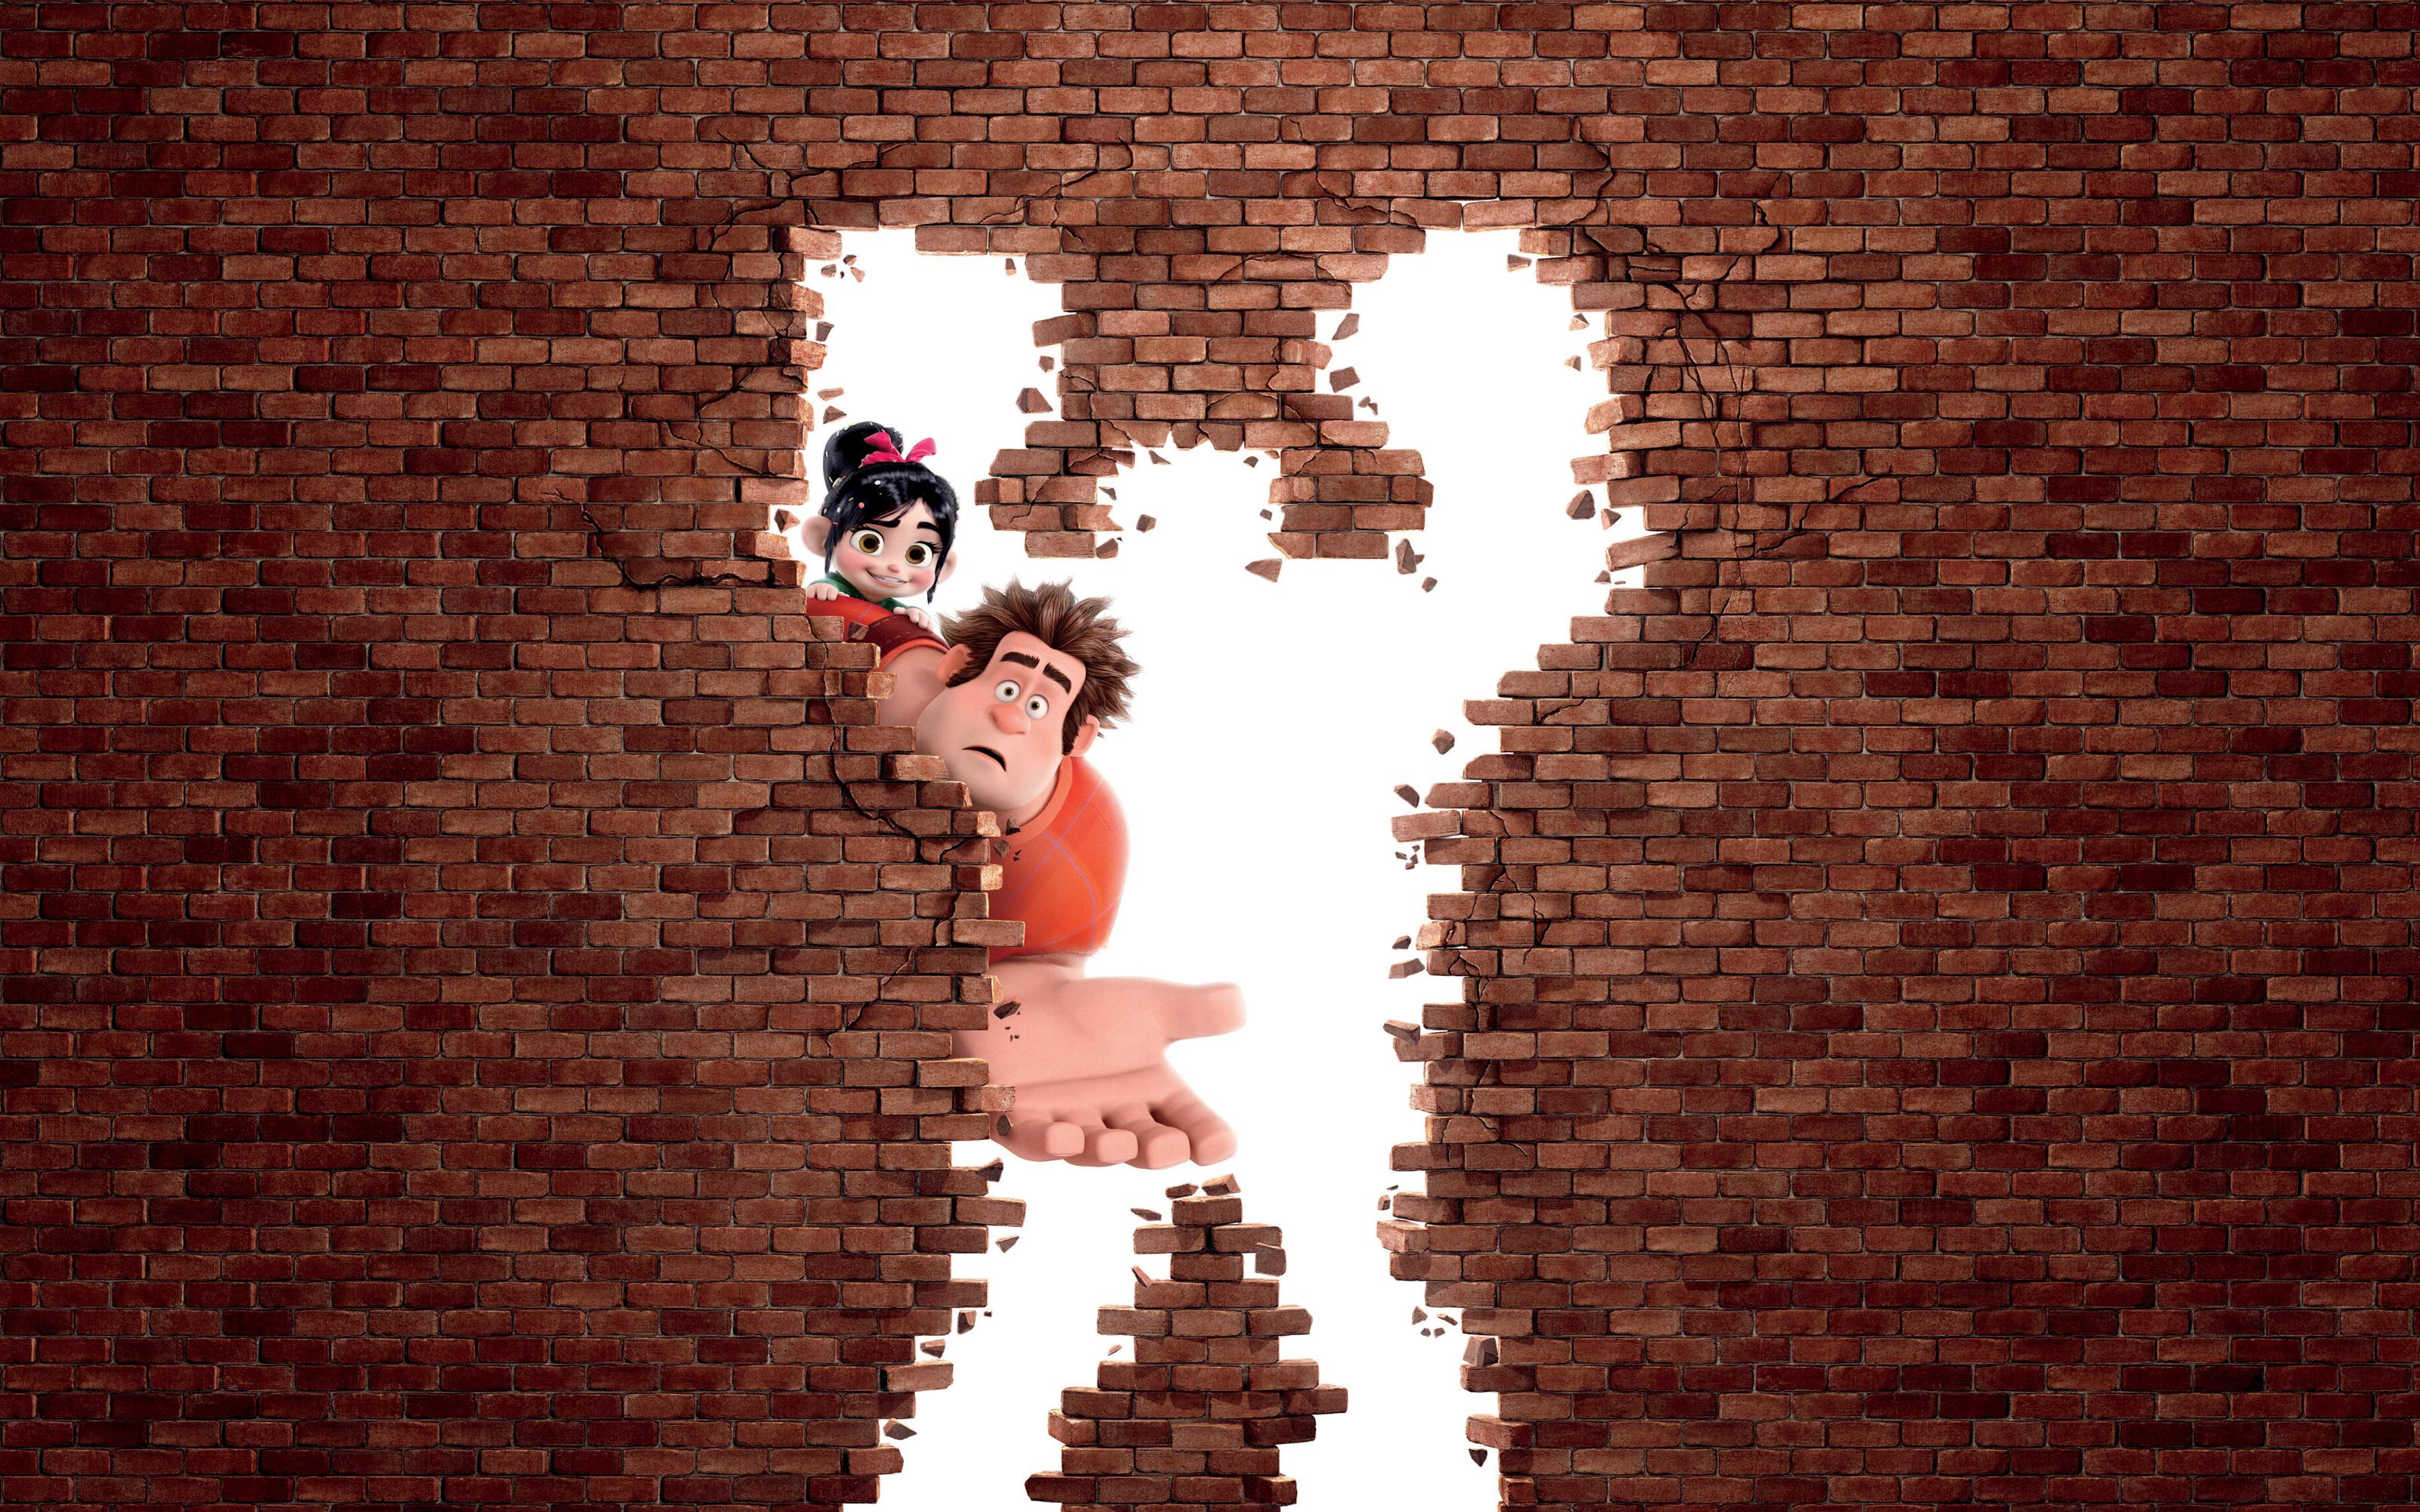 Wreck It Ralph Animation Movie 4k Hd Desktop Wallpaper For: Wreck It Ralph Animation Movie HD Wallpaper